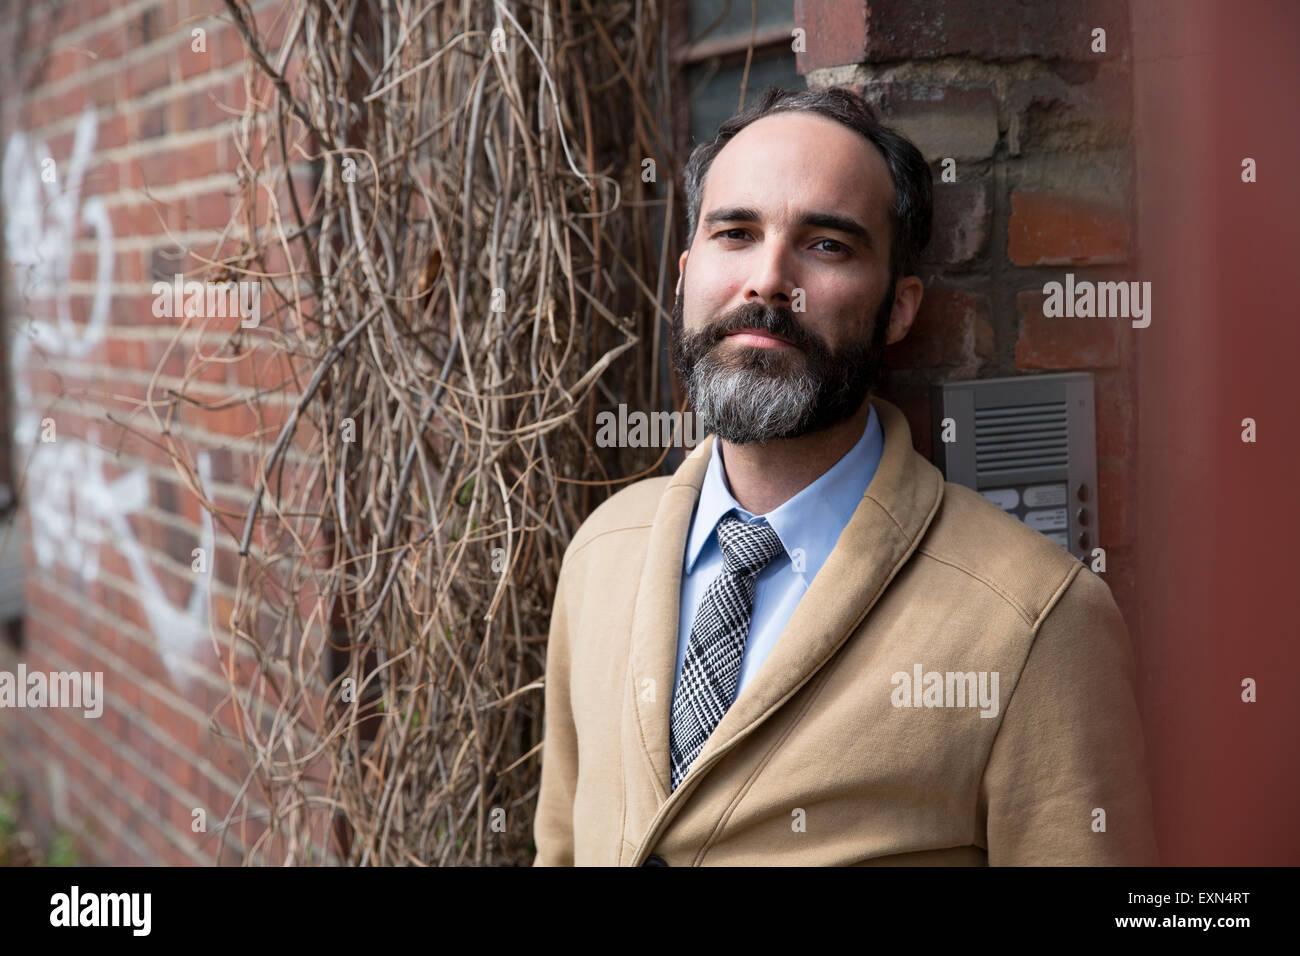 Fashionable man with grey beard leaning at door - Stock Image  sc 1 st  Alamy & Grey Beard Stock Photos \u0026 Grey Beard Stock Images - Alamy